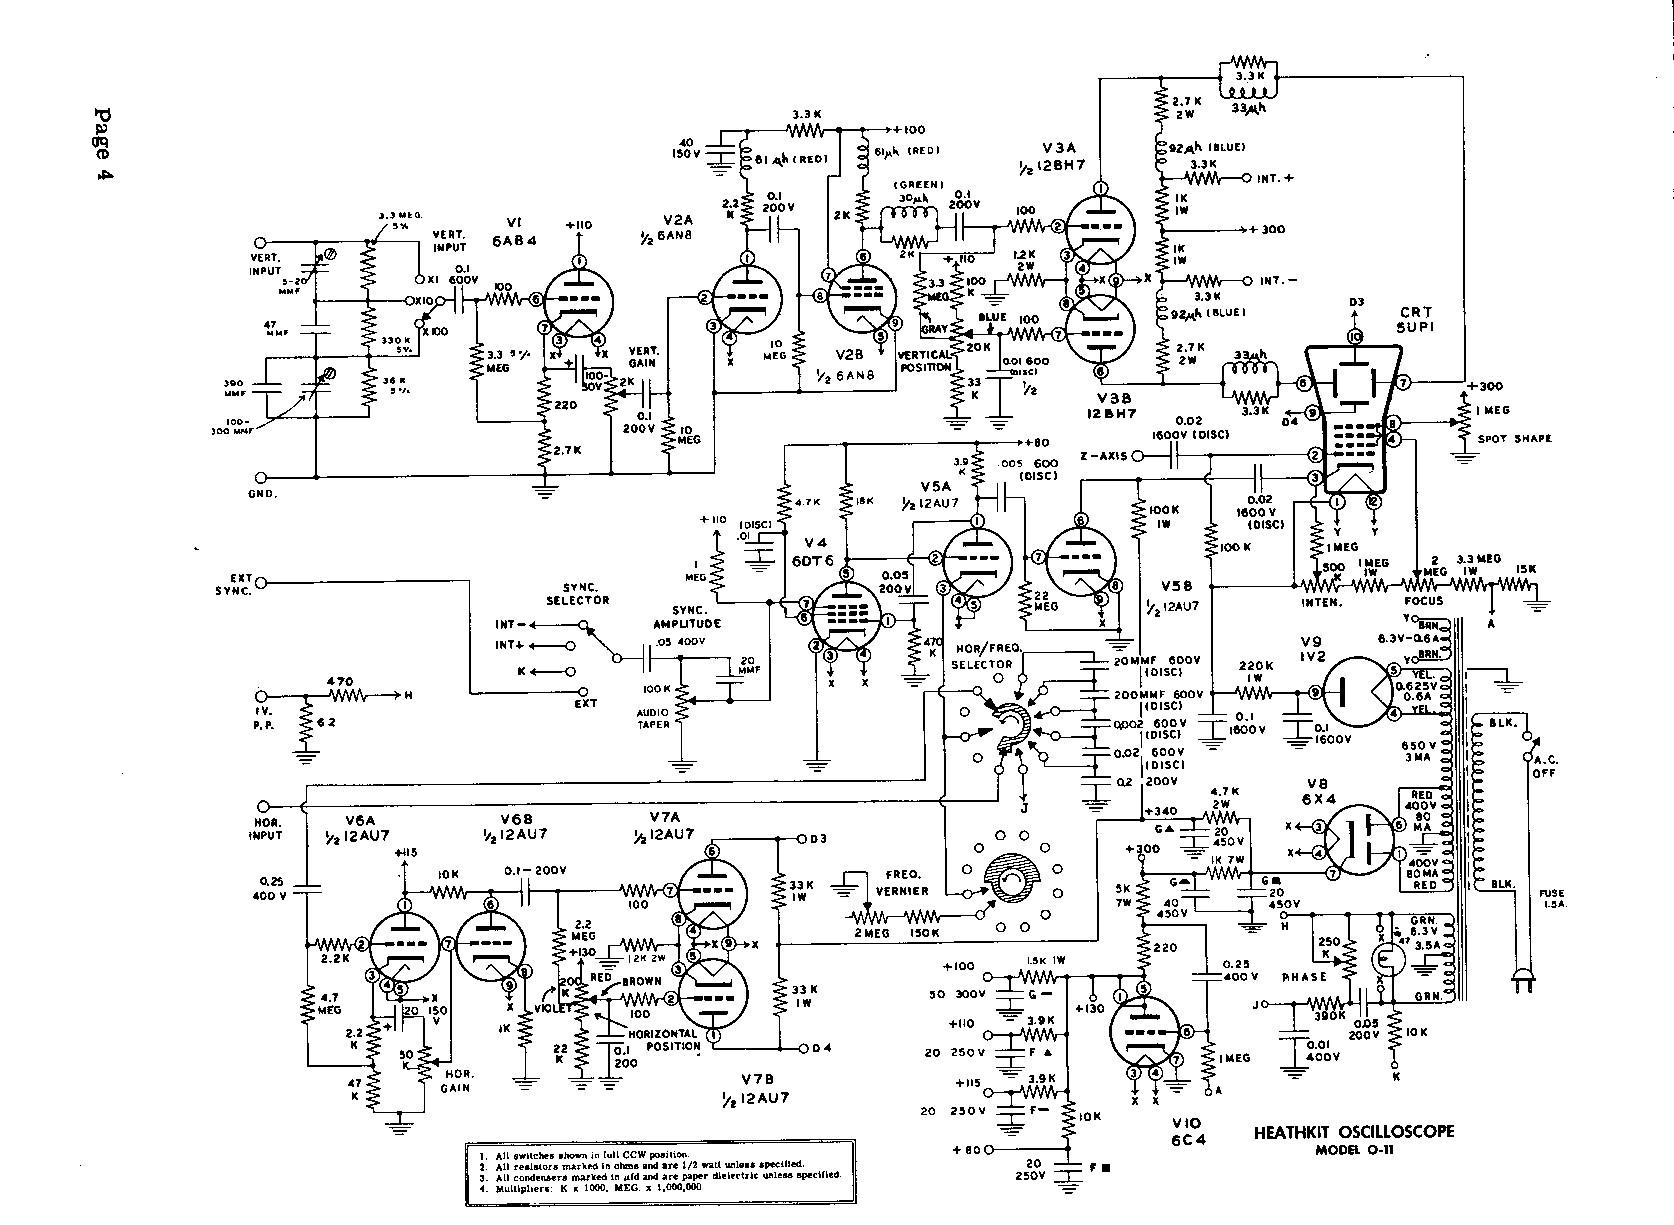 Electronics Kits B W Tv Circuit Diagram Heathkit O 11 Oscilloscope Schematics